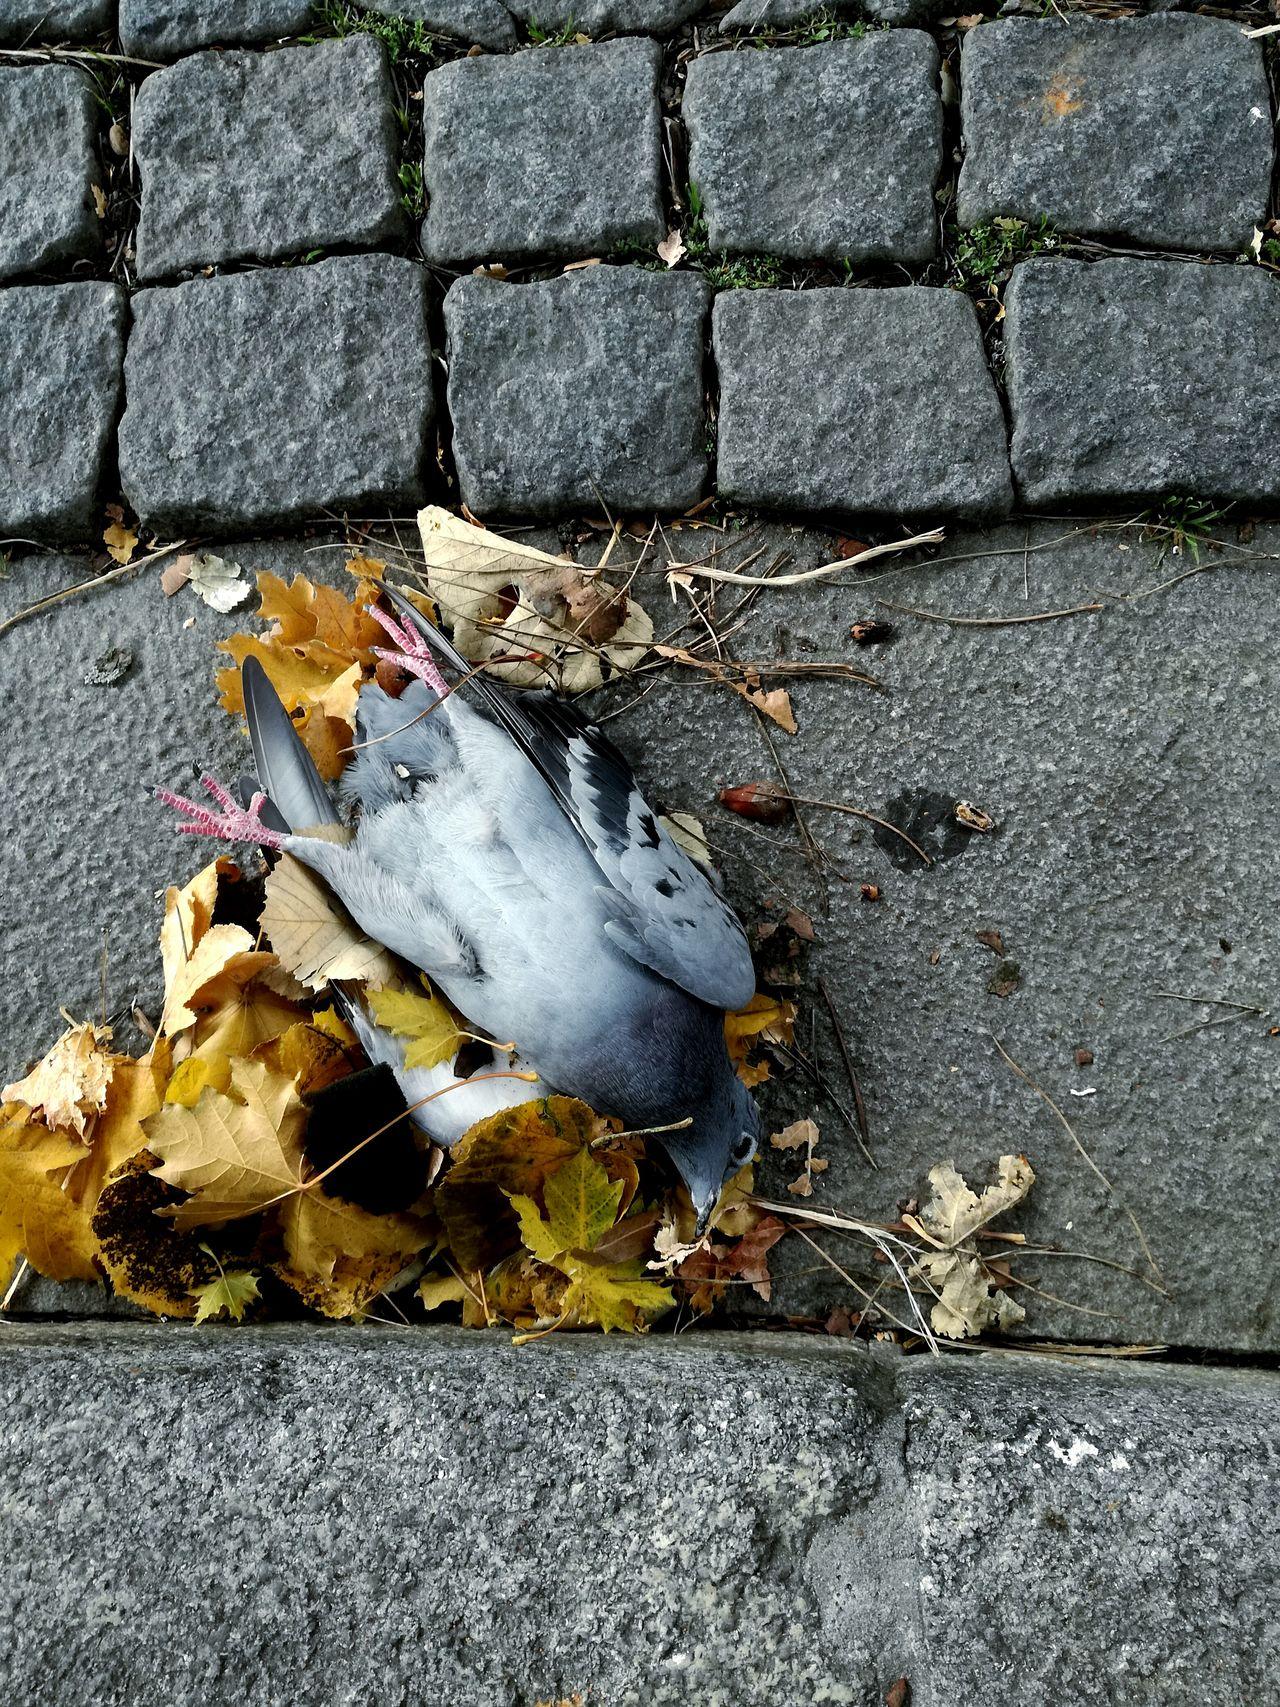 Dead leaves and dead animal. Dead Dove Autumn Leaves Street Dead Animal